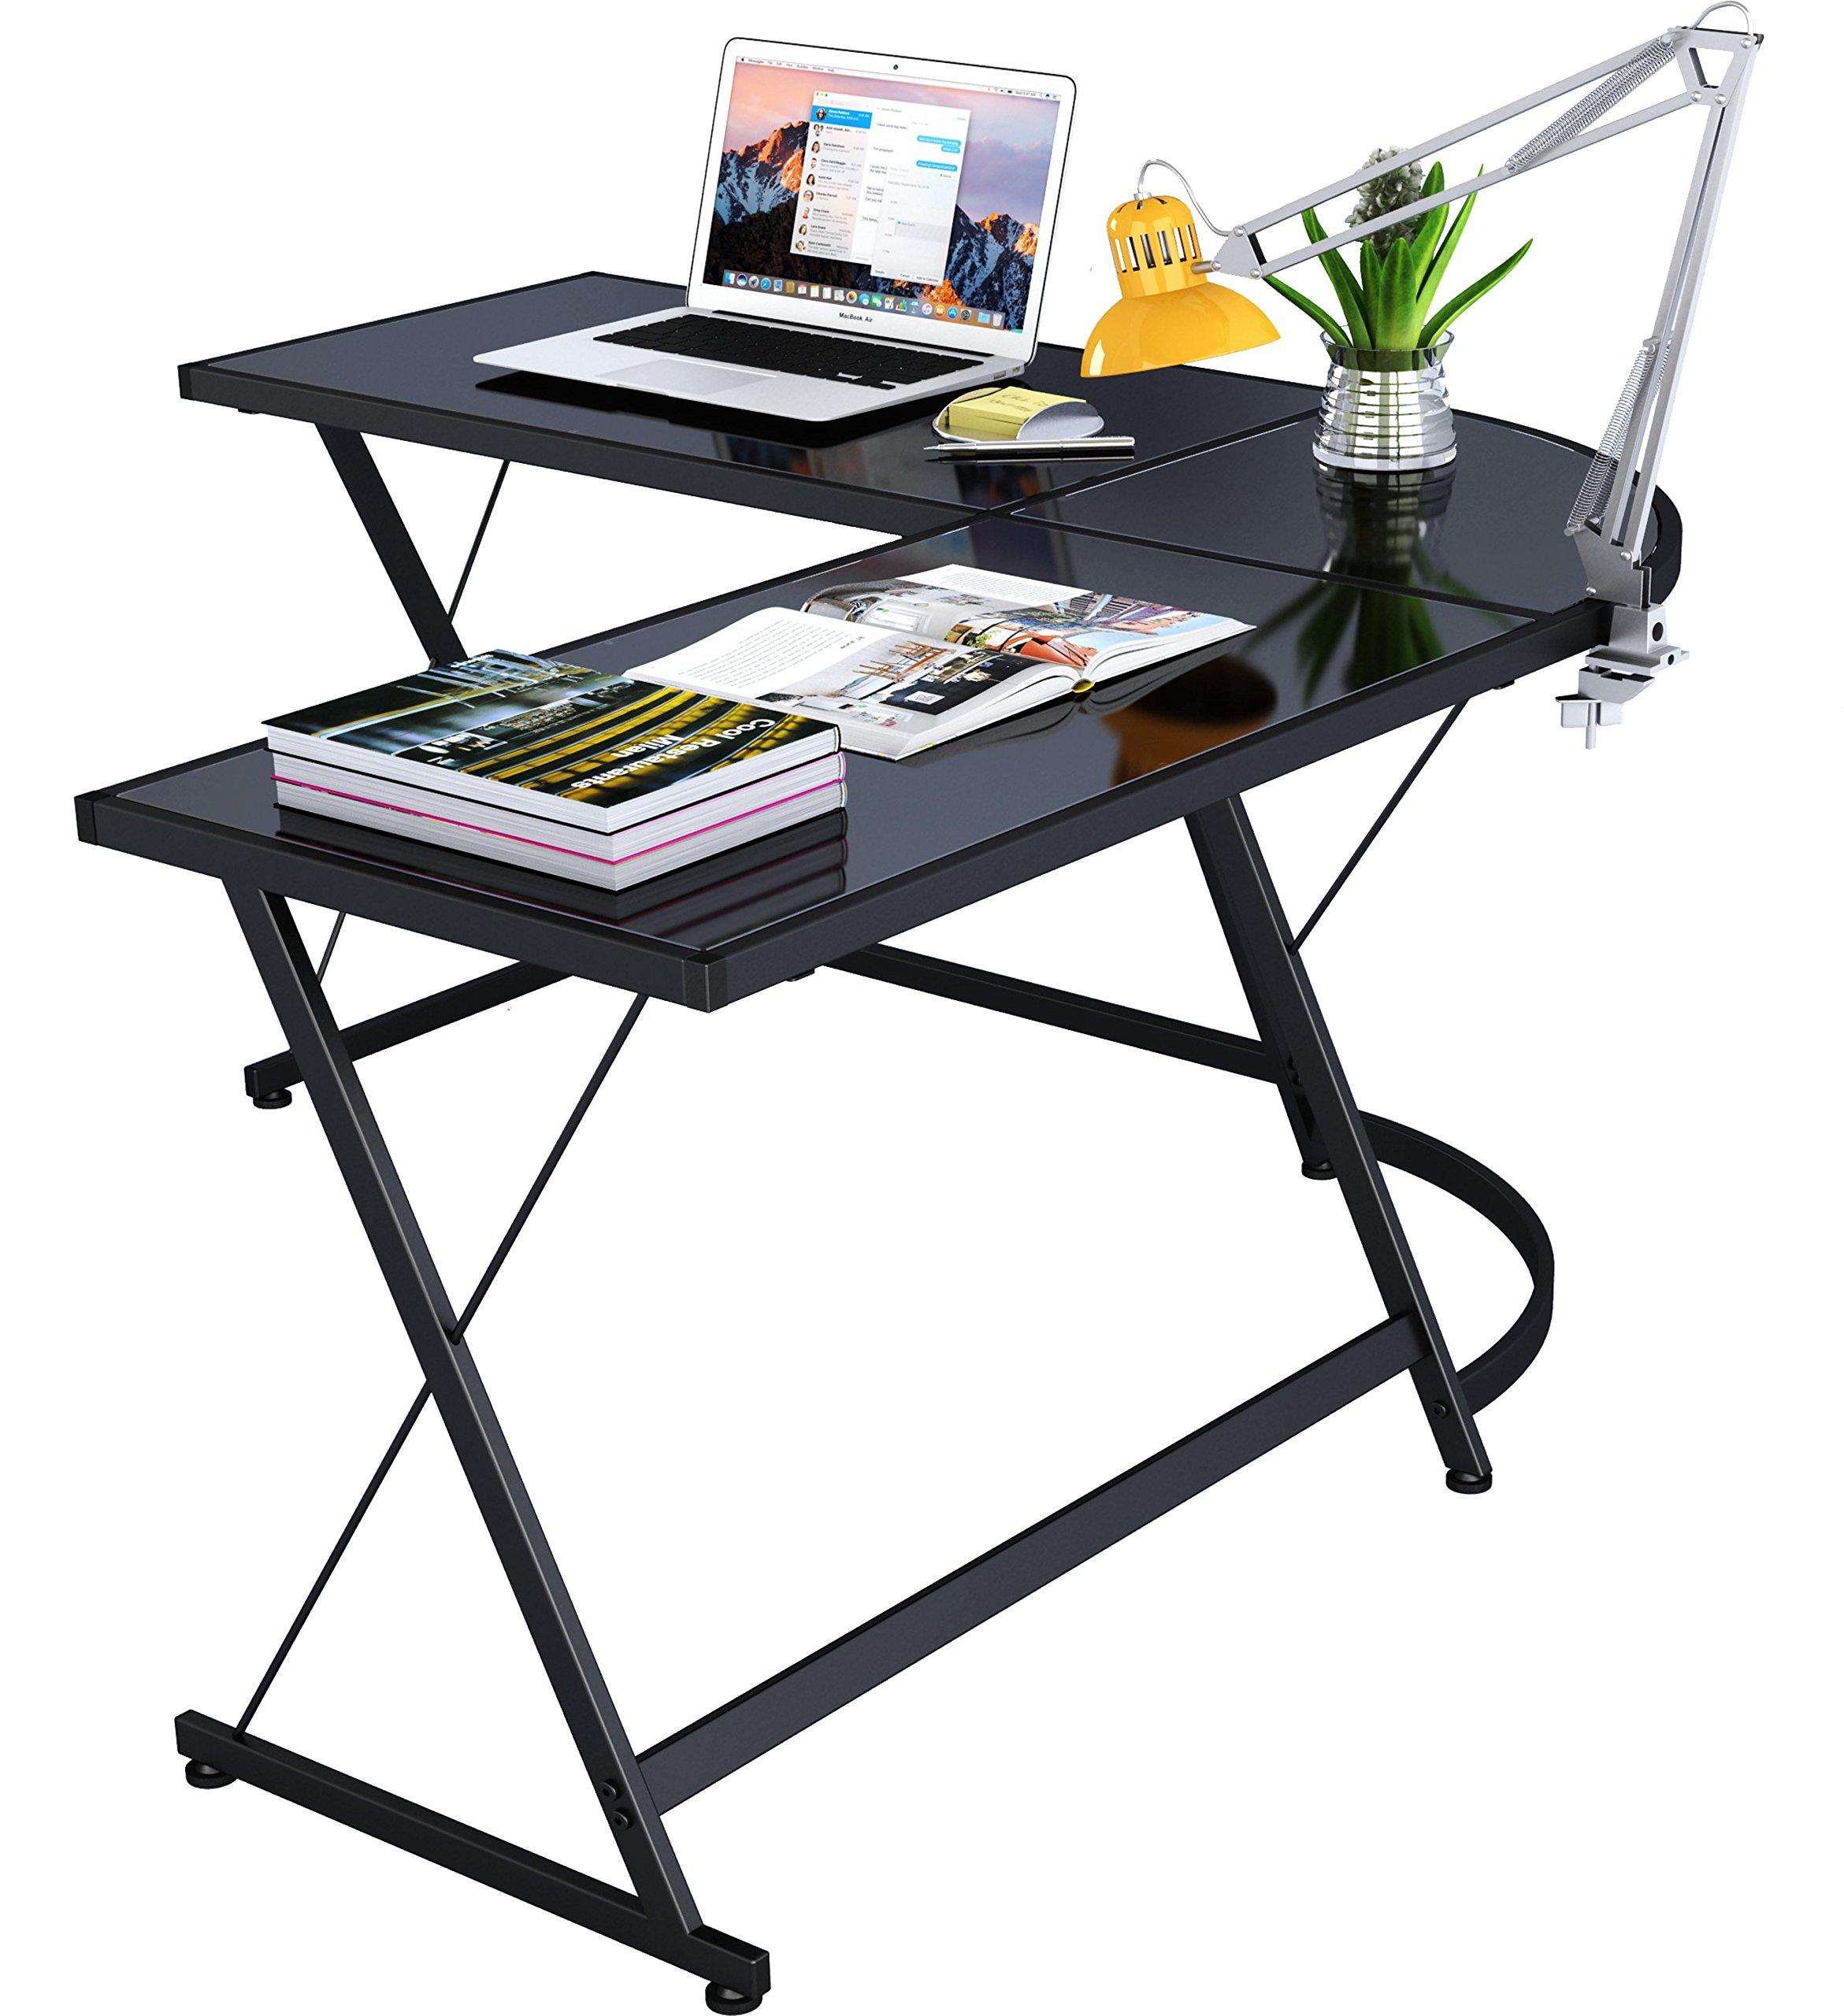 SHW L-Shaped Home Office Corner Desk by SHW (Image #6)